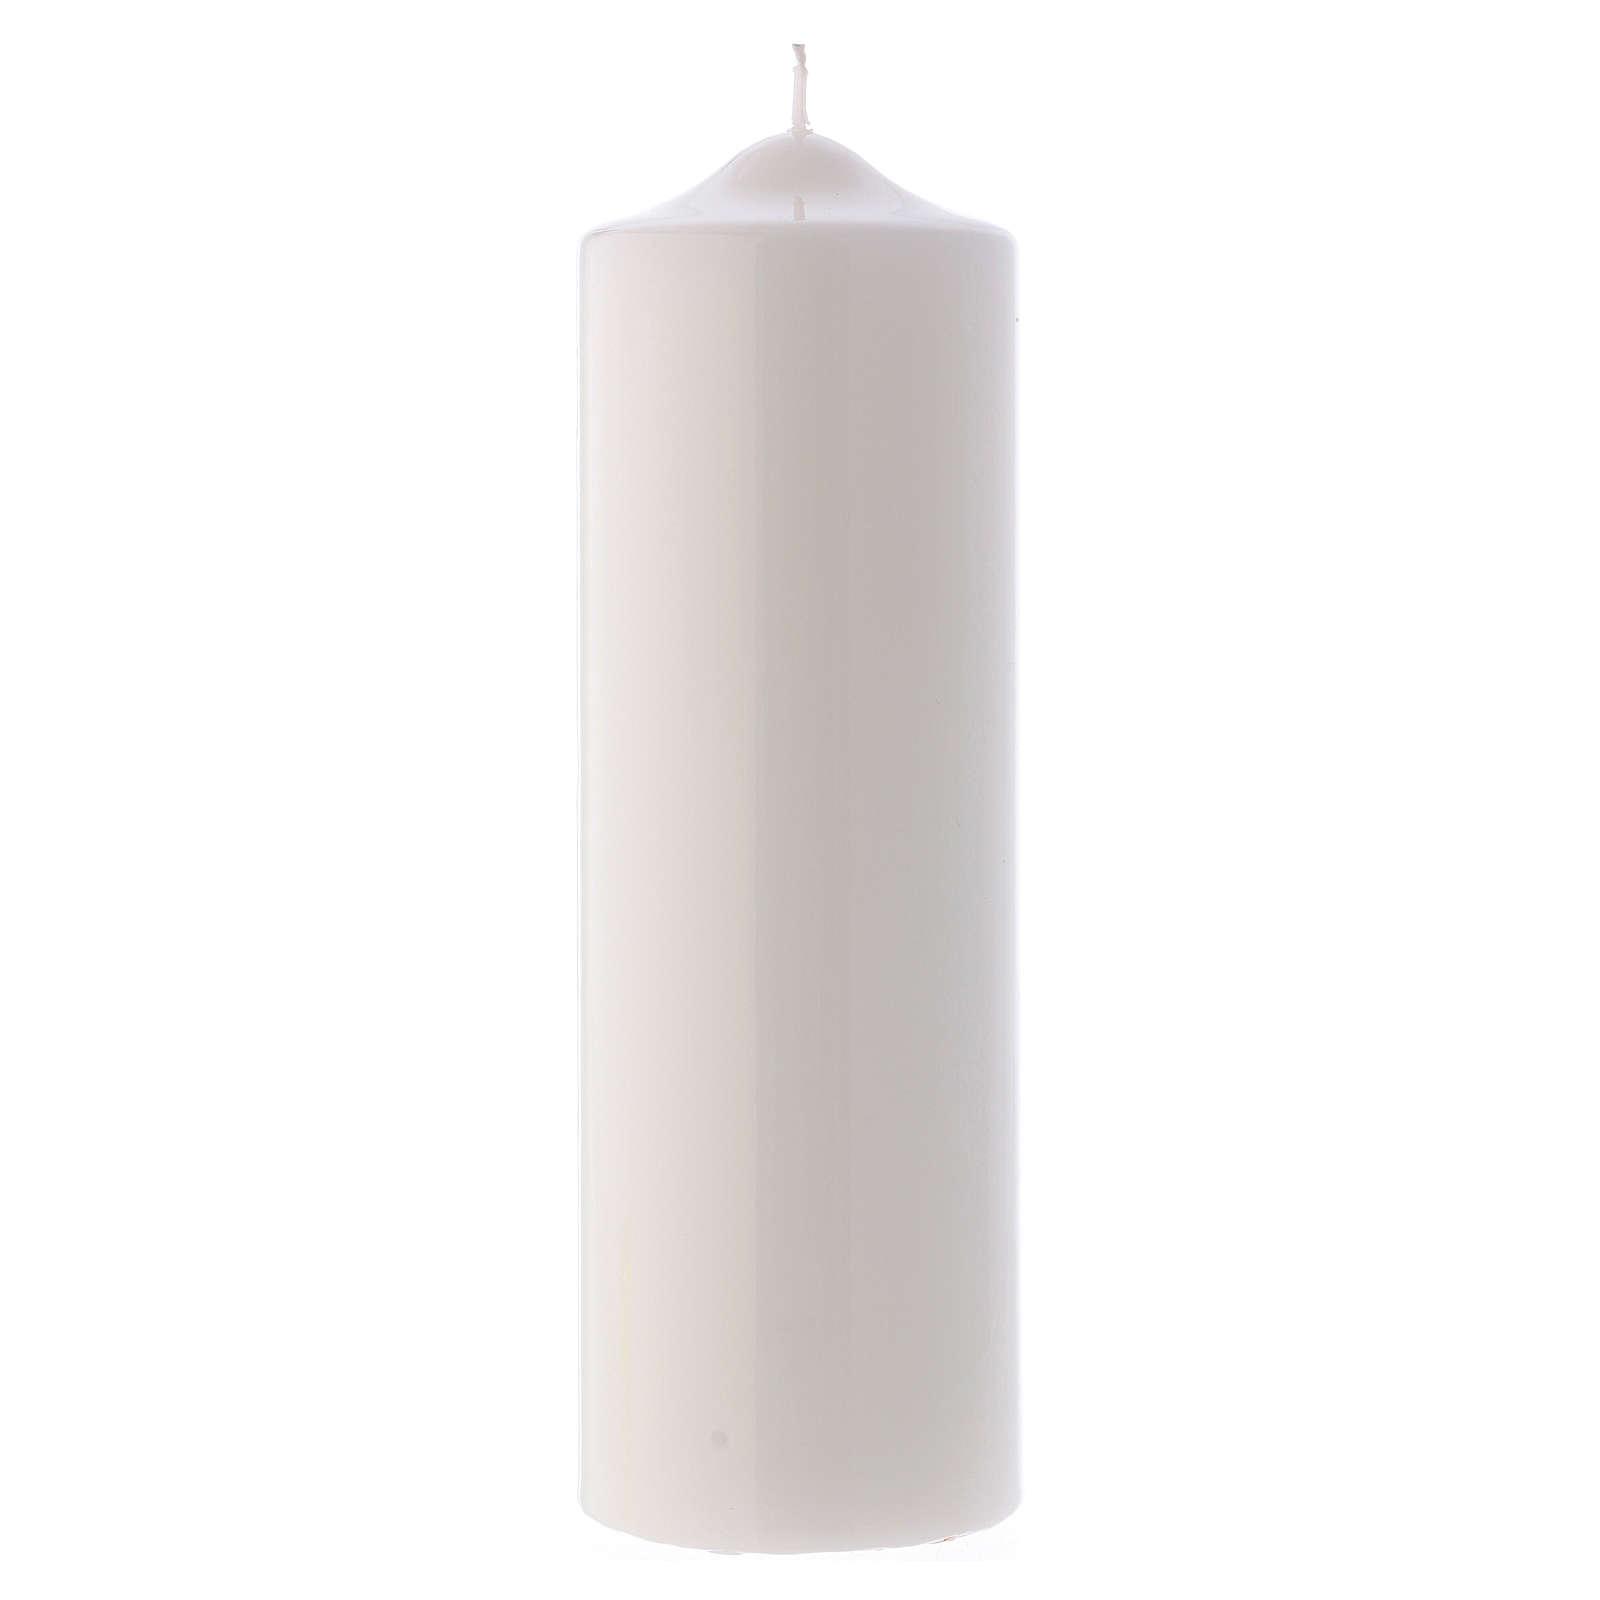 Cirio Litúrgico Lúcido Ceralacca 24x8 cm blanco 3